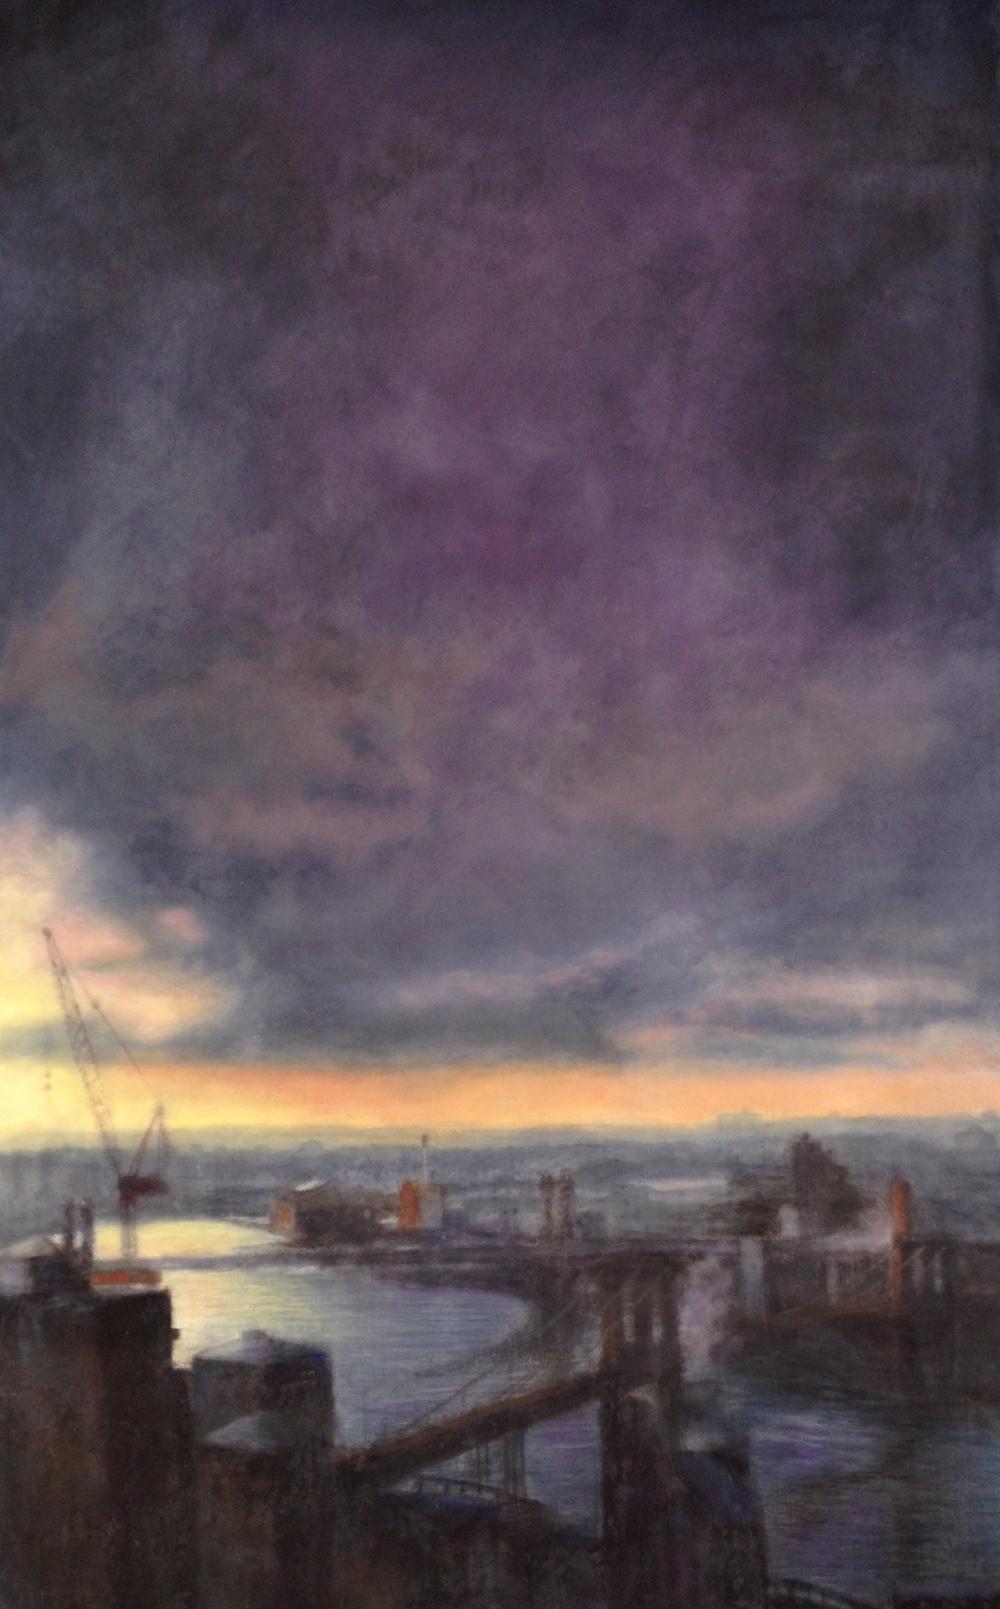 Morning Crane • 52 x 83